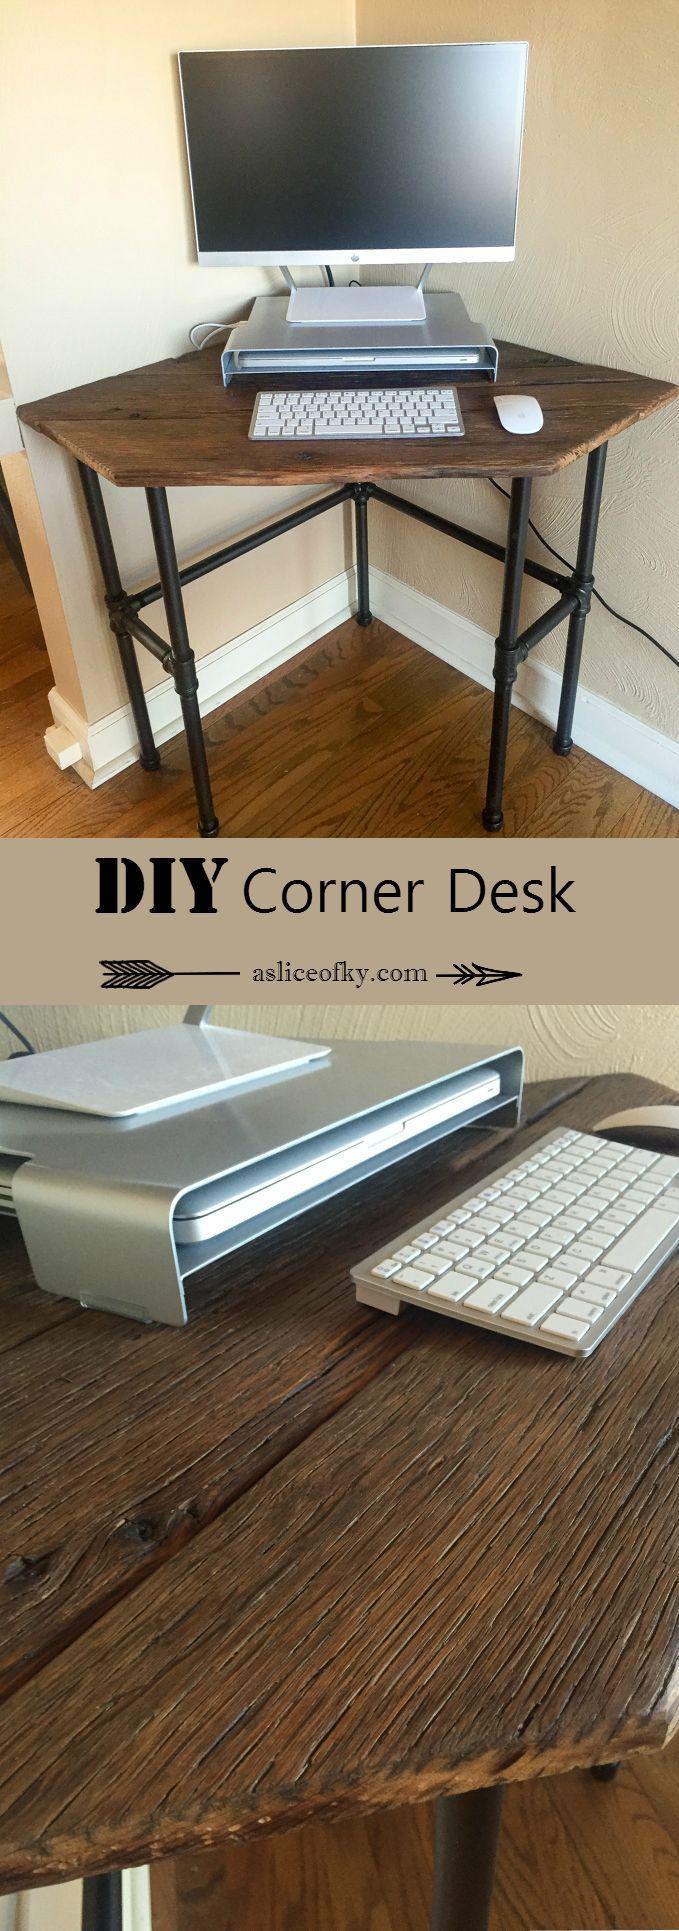 25 best ideas about small corner desk on pinterest white corner desk small bedroom office - Diy small corner desk ...